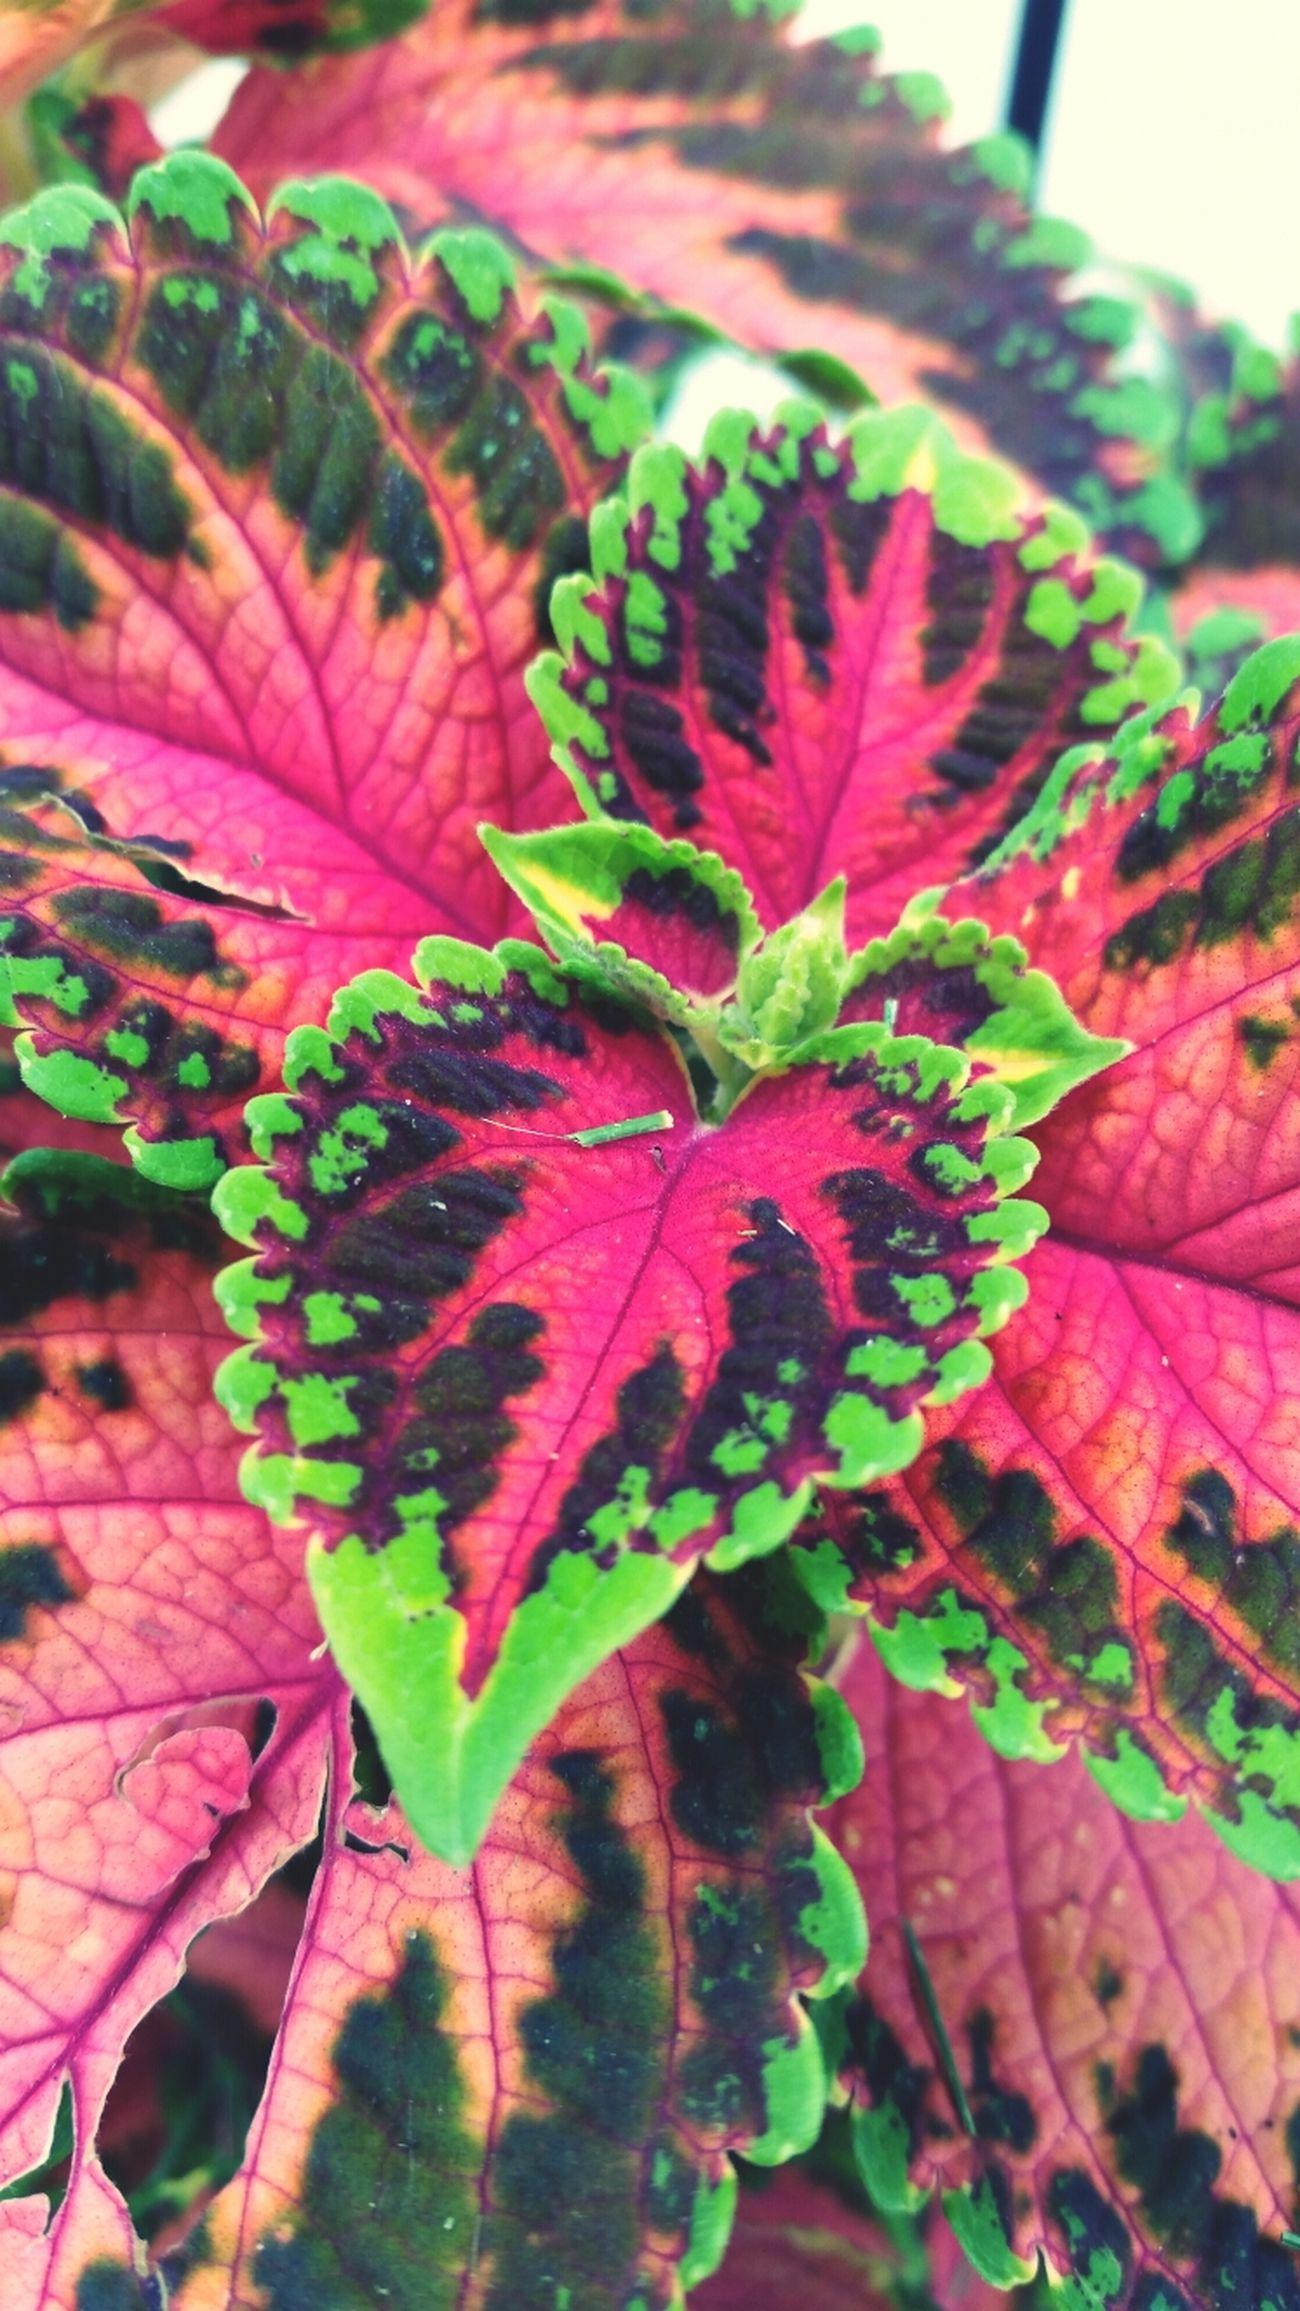 SummerPlant Summerflower Colorful GalaxyS5